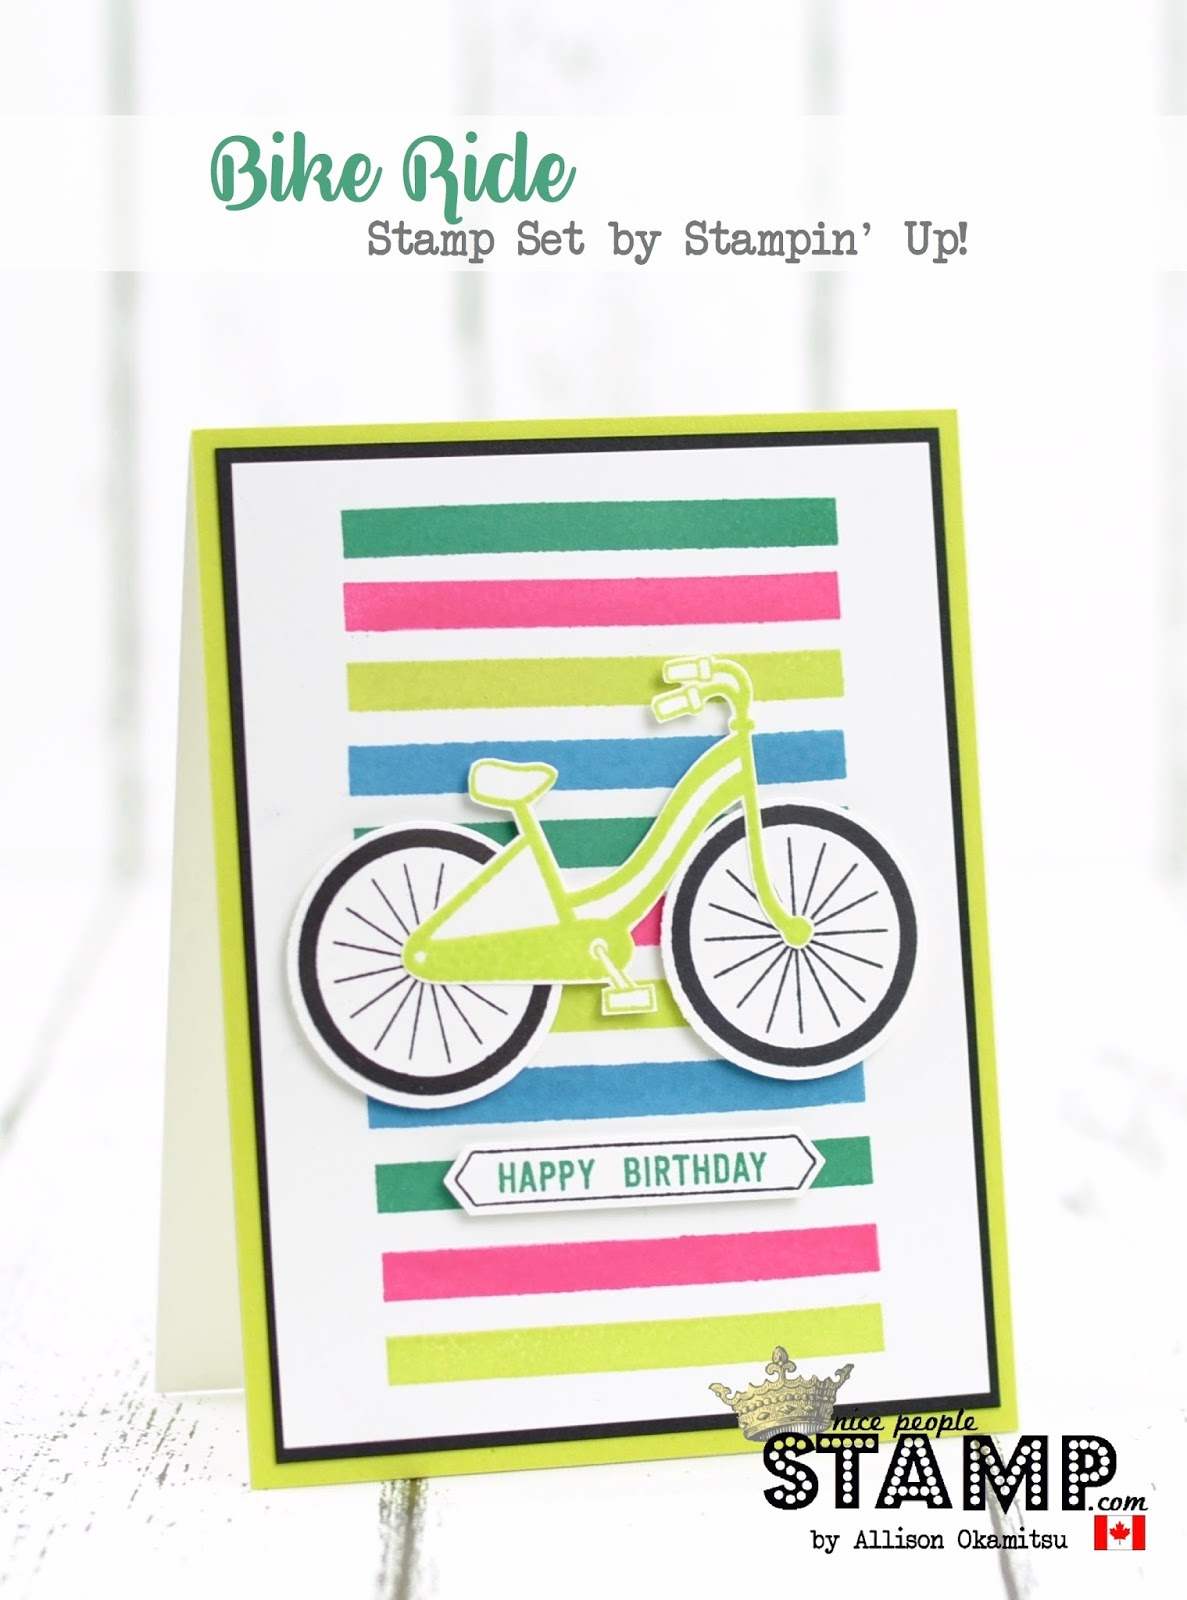 c9971fc7770 nice people STAMP! - Stampin' Up! Canada: Bike Ride Birthday Card ...